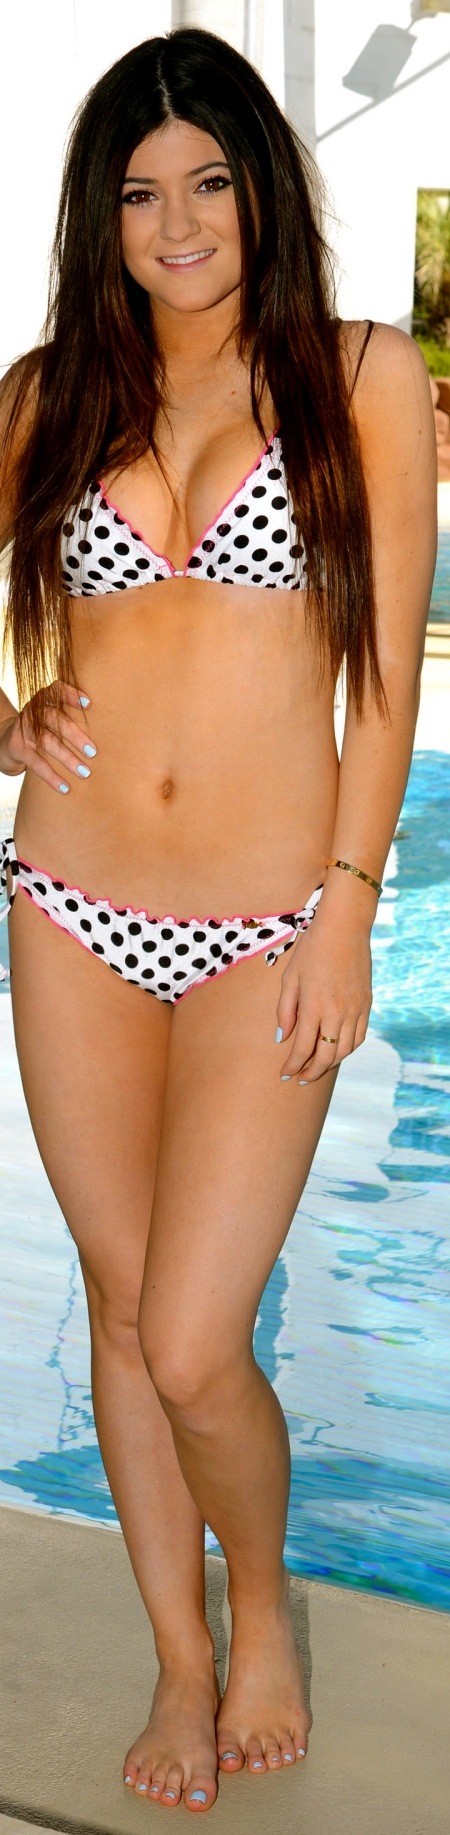 EXPOSTAS_com_Kylie_Jenner_Modeling_a_Kardashian_Khaos_bikini_at_Mirage_Hotel_Pool